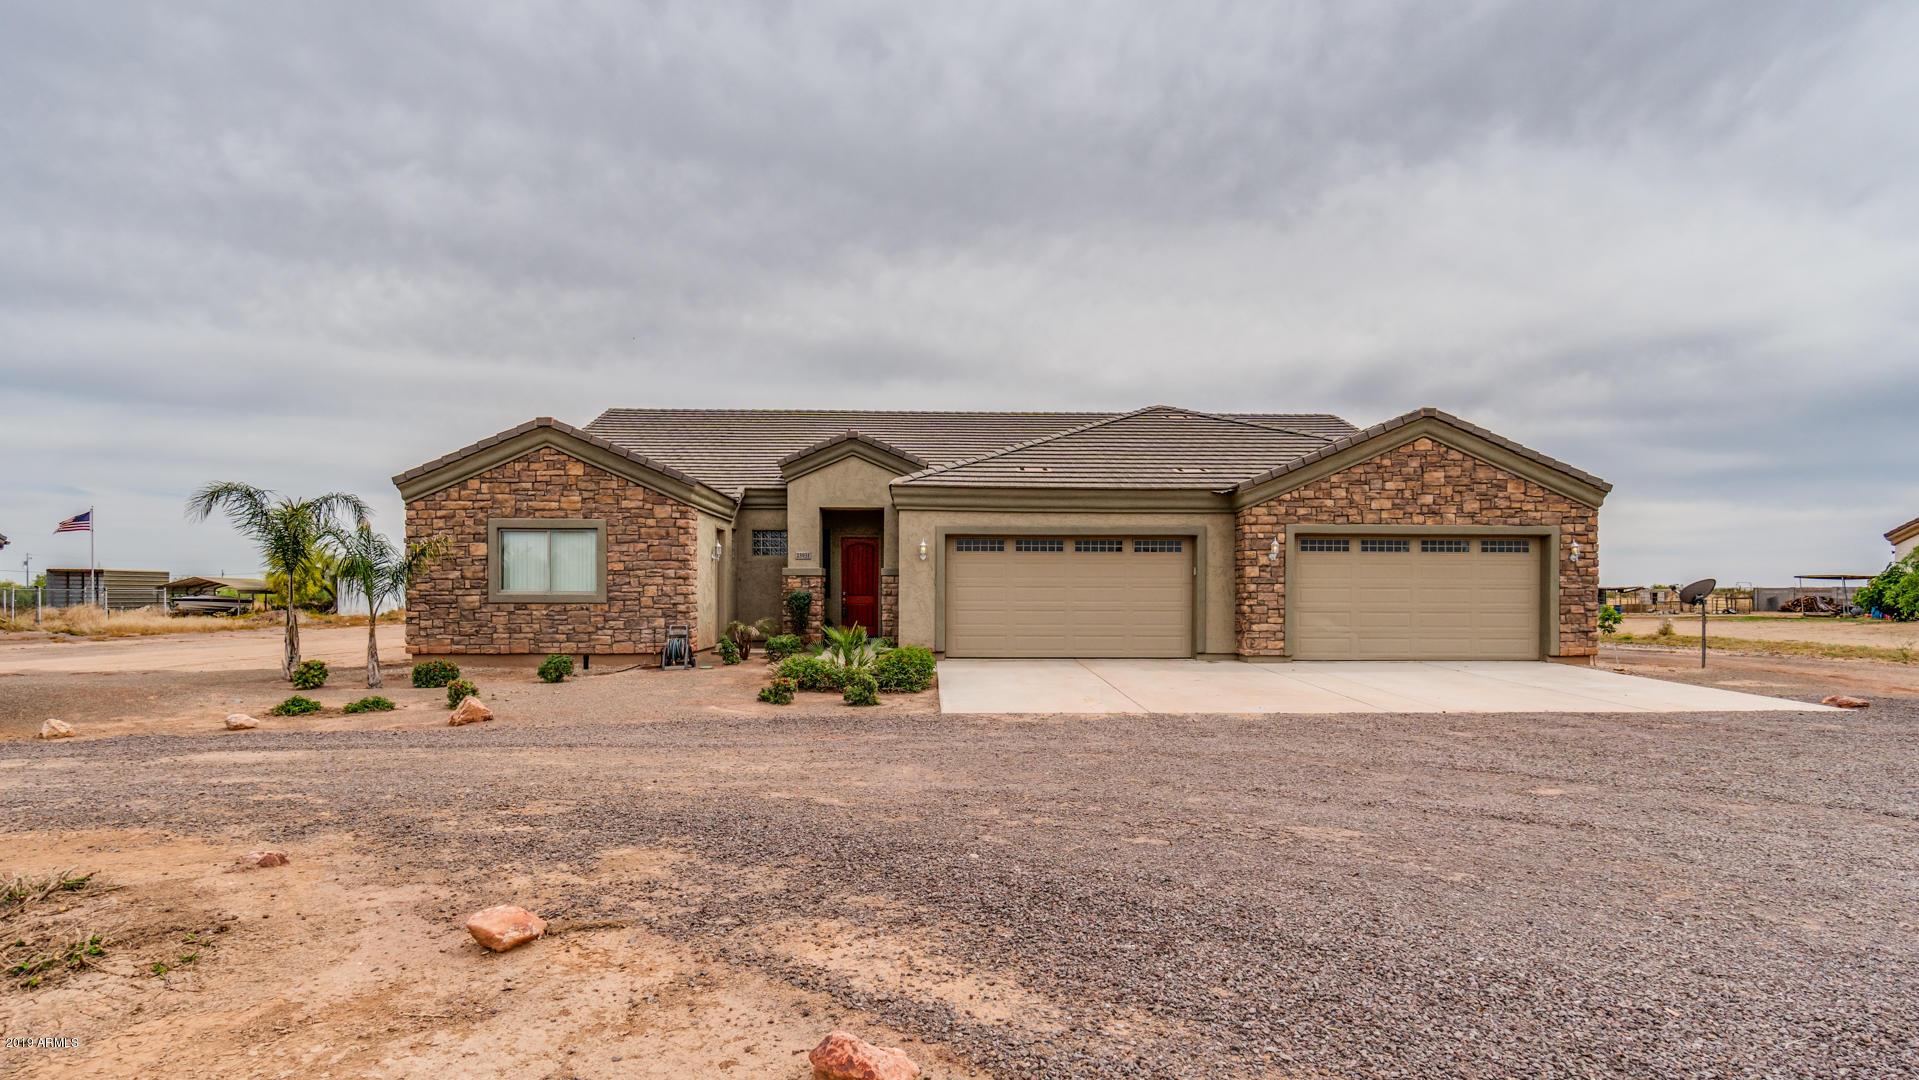 Photo of 23931 W PINNACLE VISTA Lane, Wittmann, AZ 85361